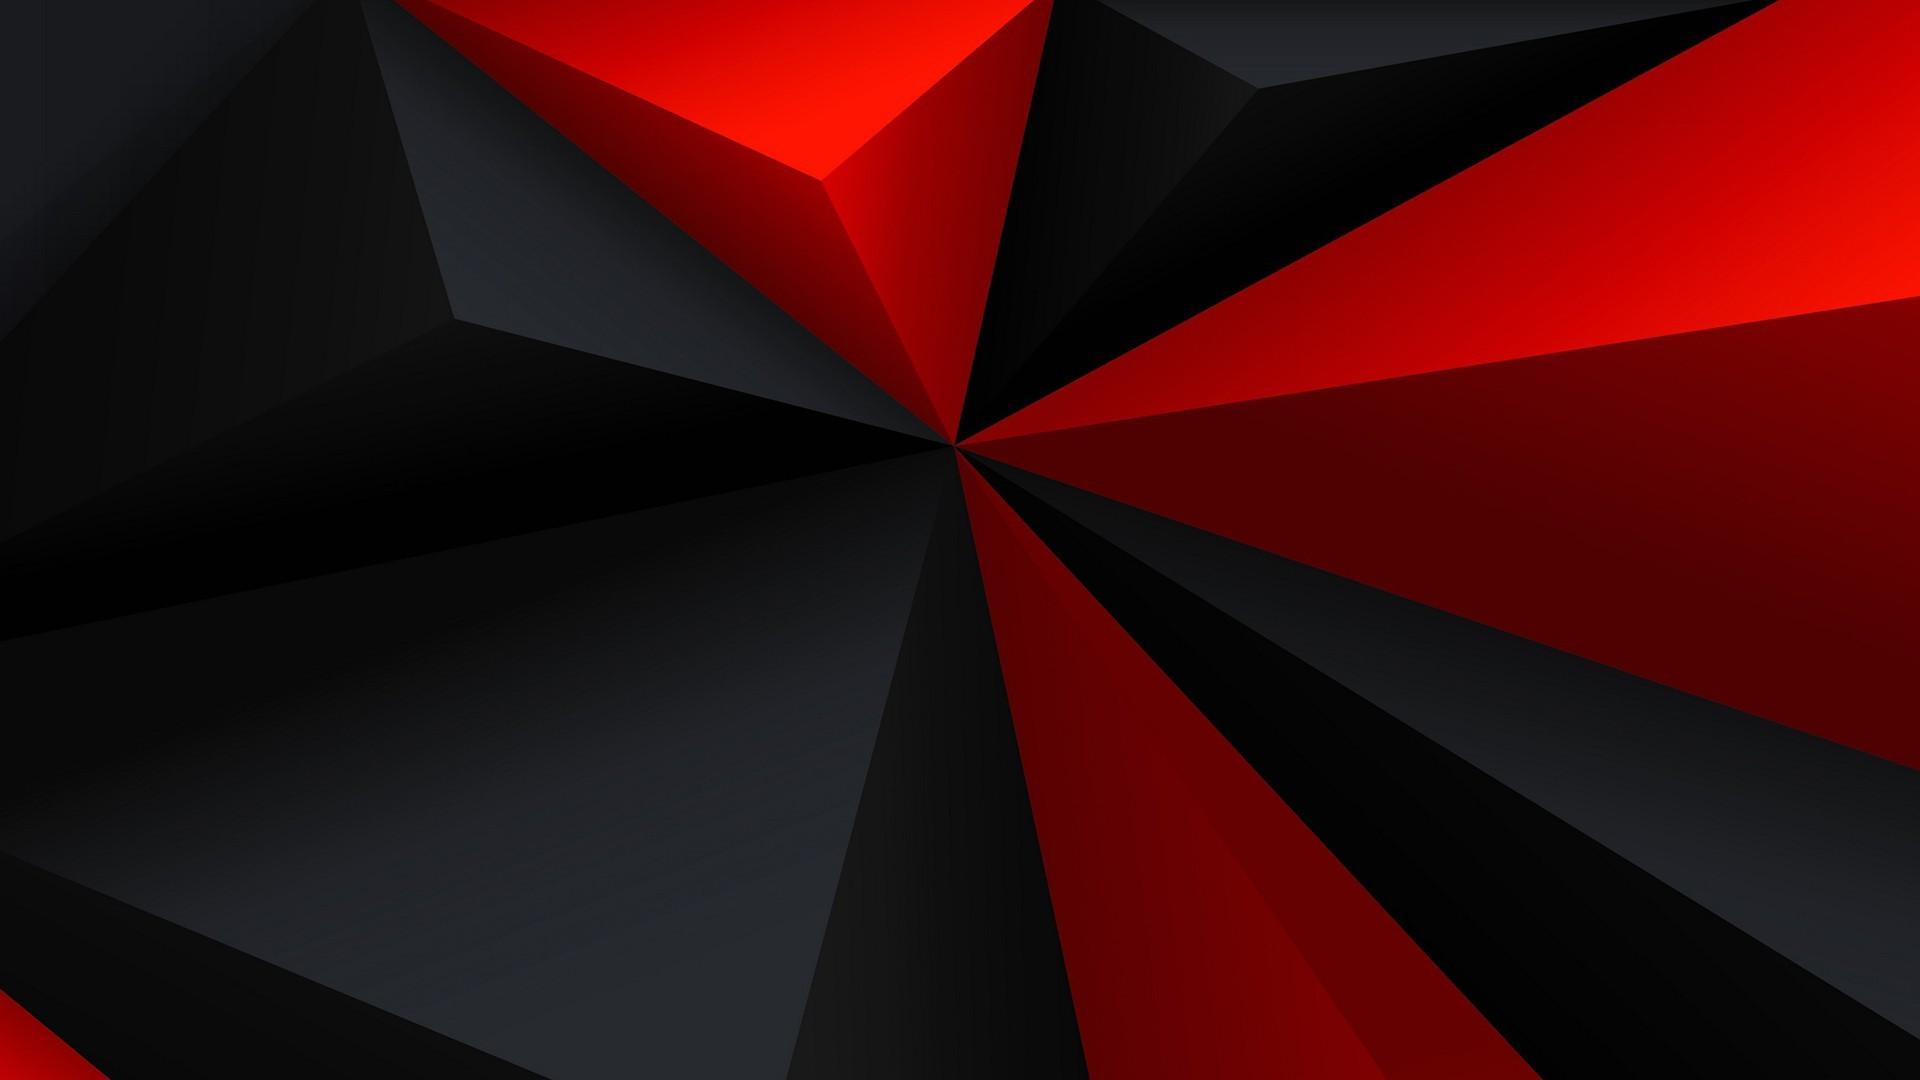 Abstract Computer Wallpapers, Desktop Backgrounds | | ID .